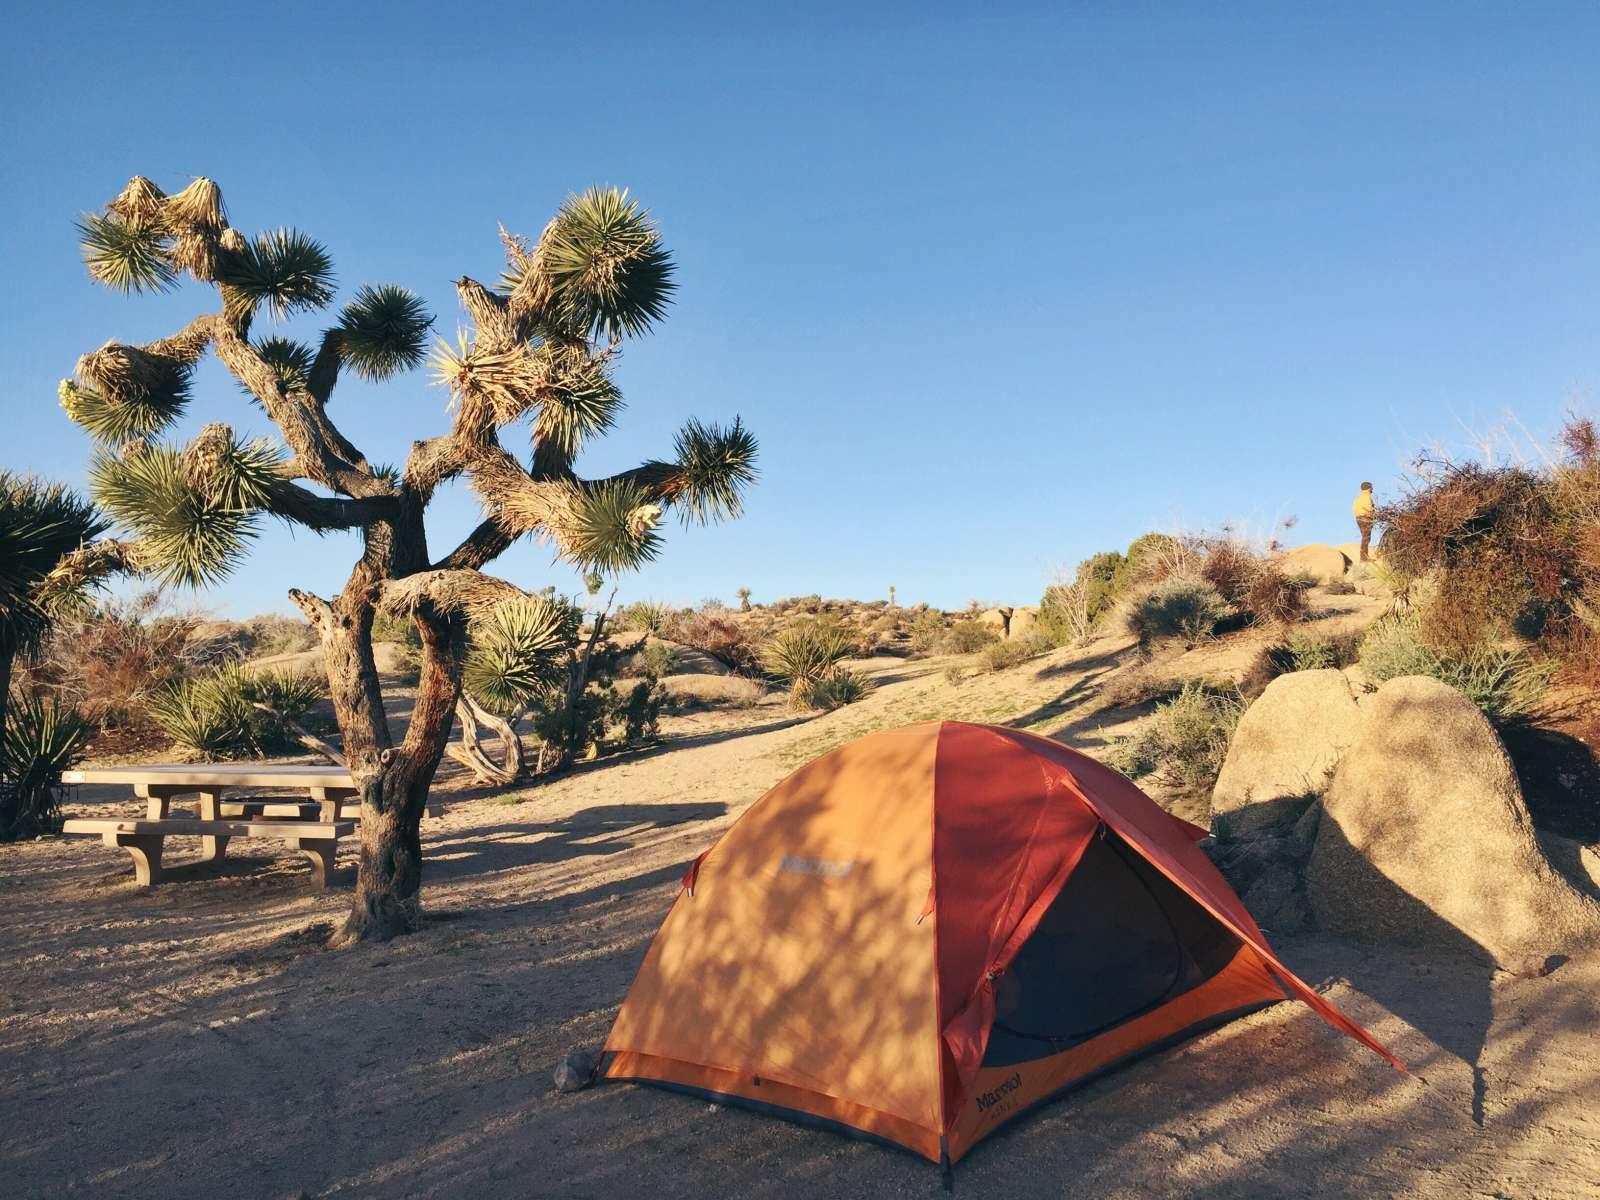 ... Sarah V.'s photo at Jumbo Rocks Campground ...